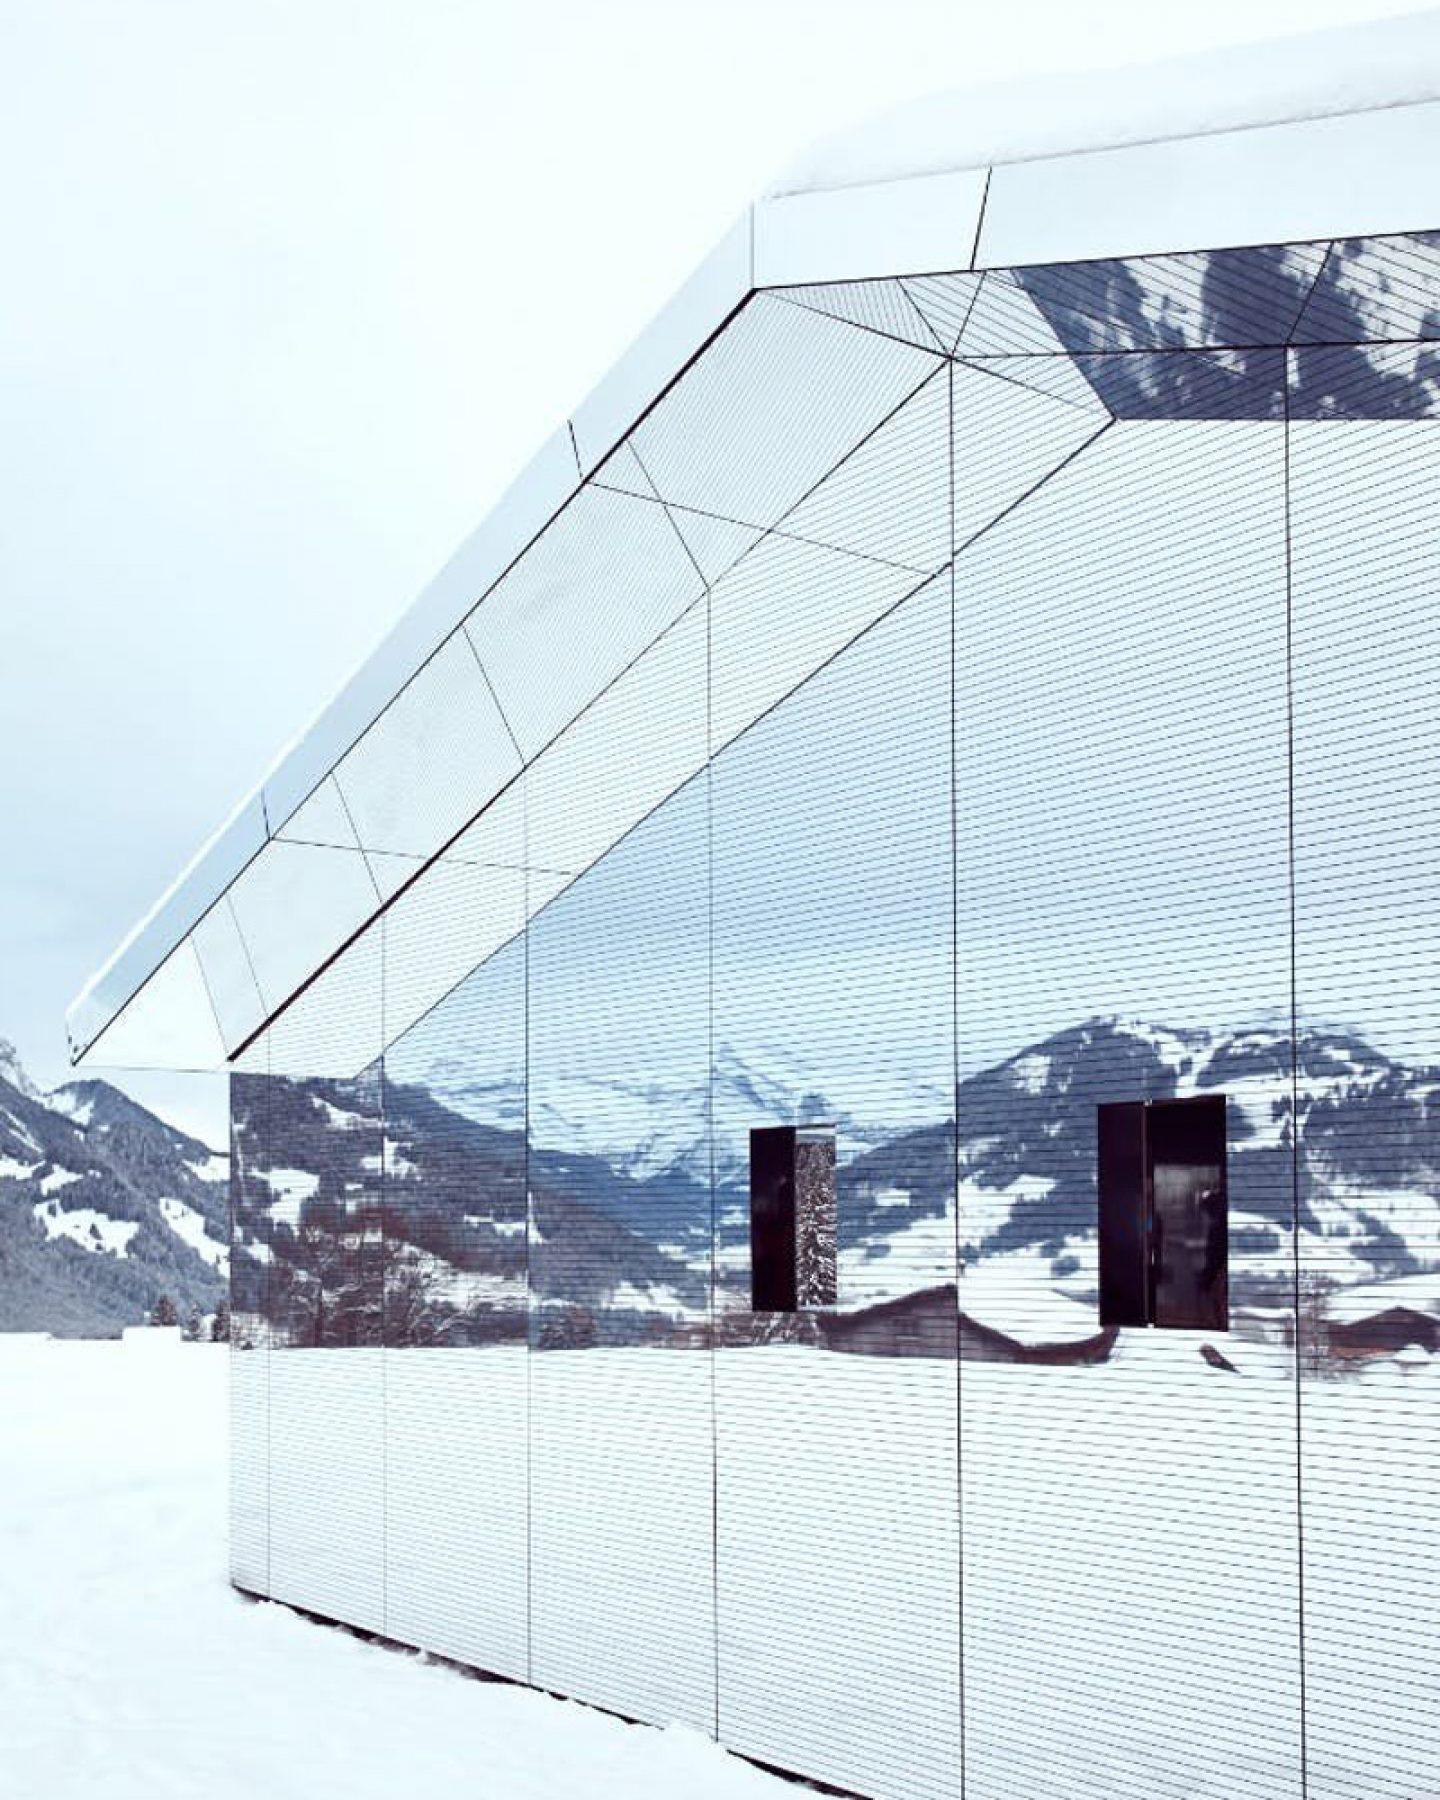 ignant-architecture-doug-aitken-mirage-gstaad-11